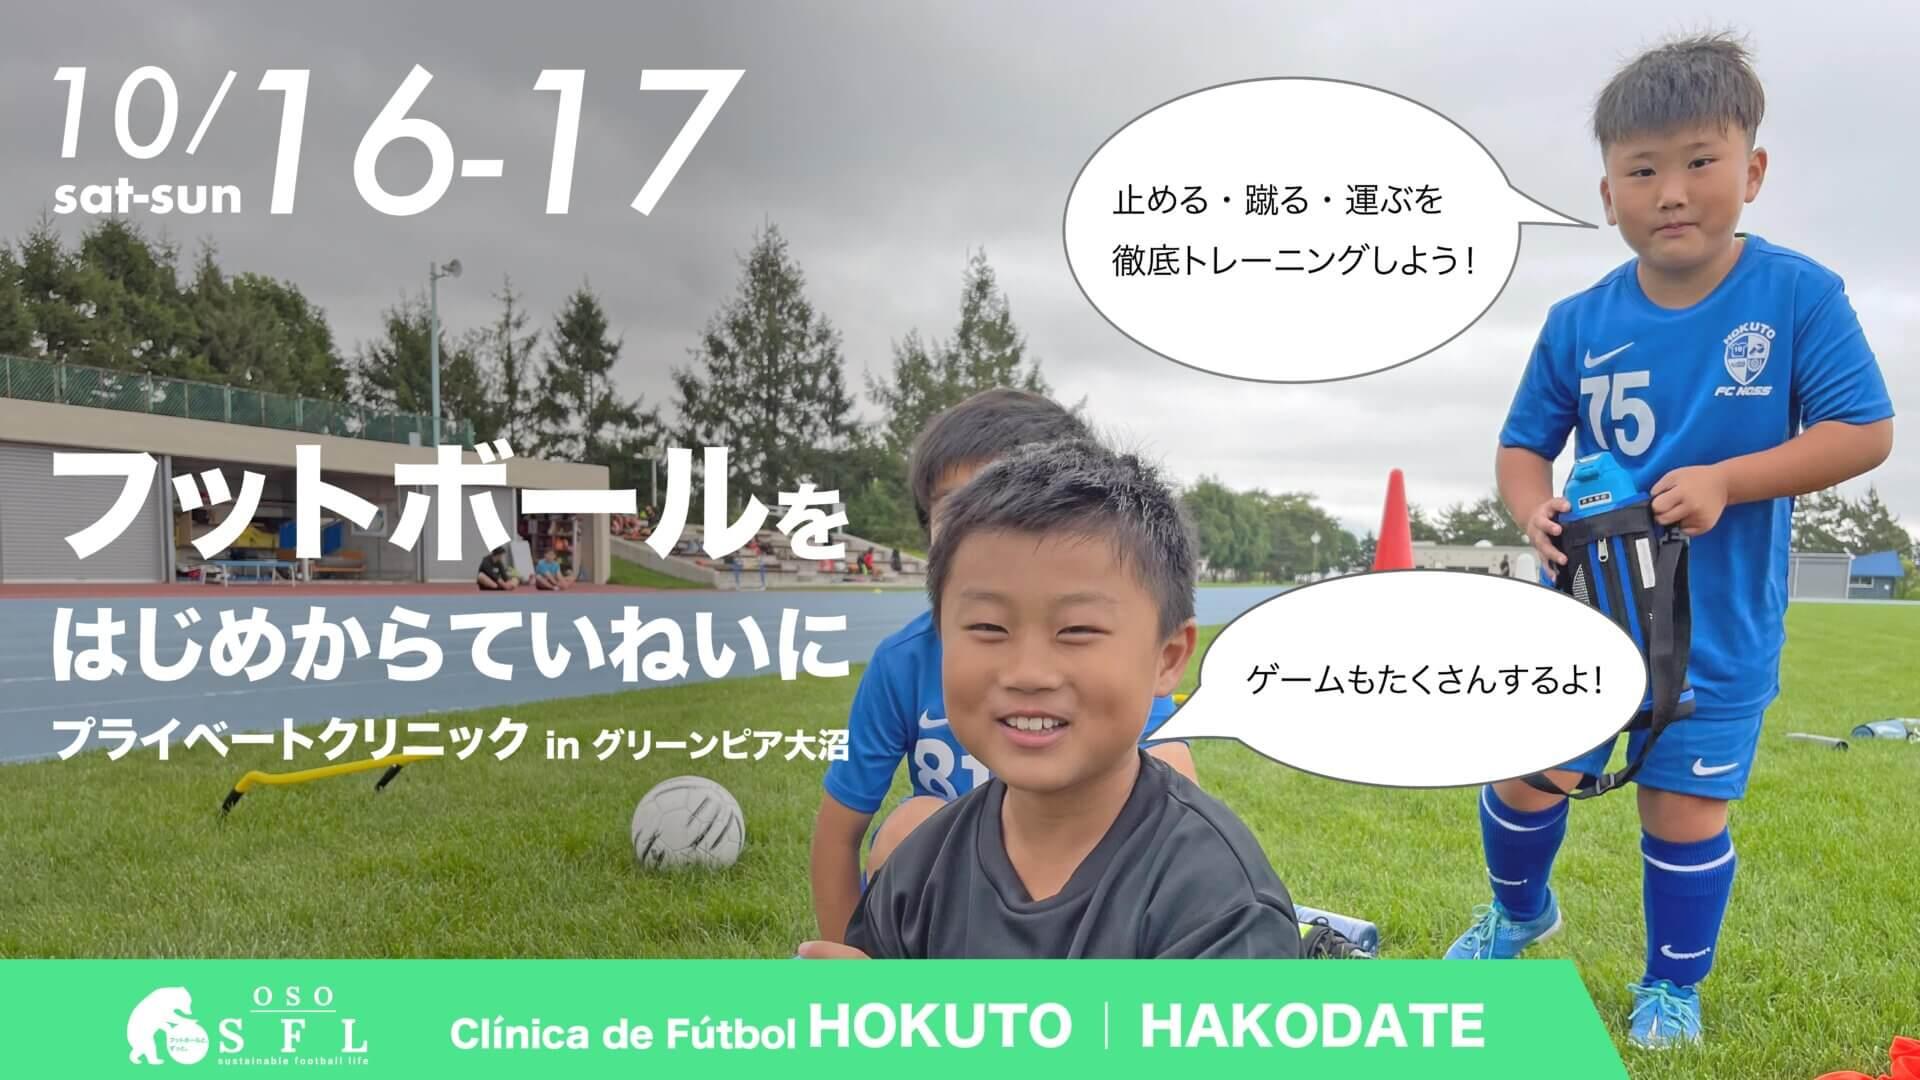 leaflet-hokuto-hakodate-clinic-211016-17_1920px